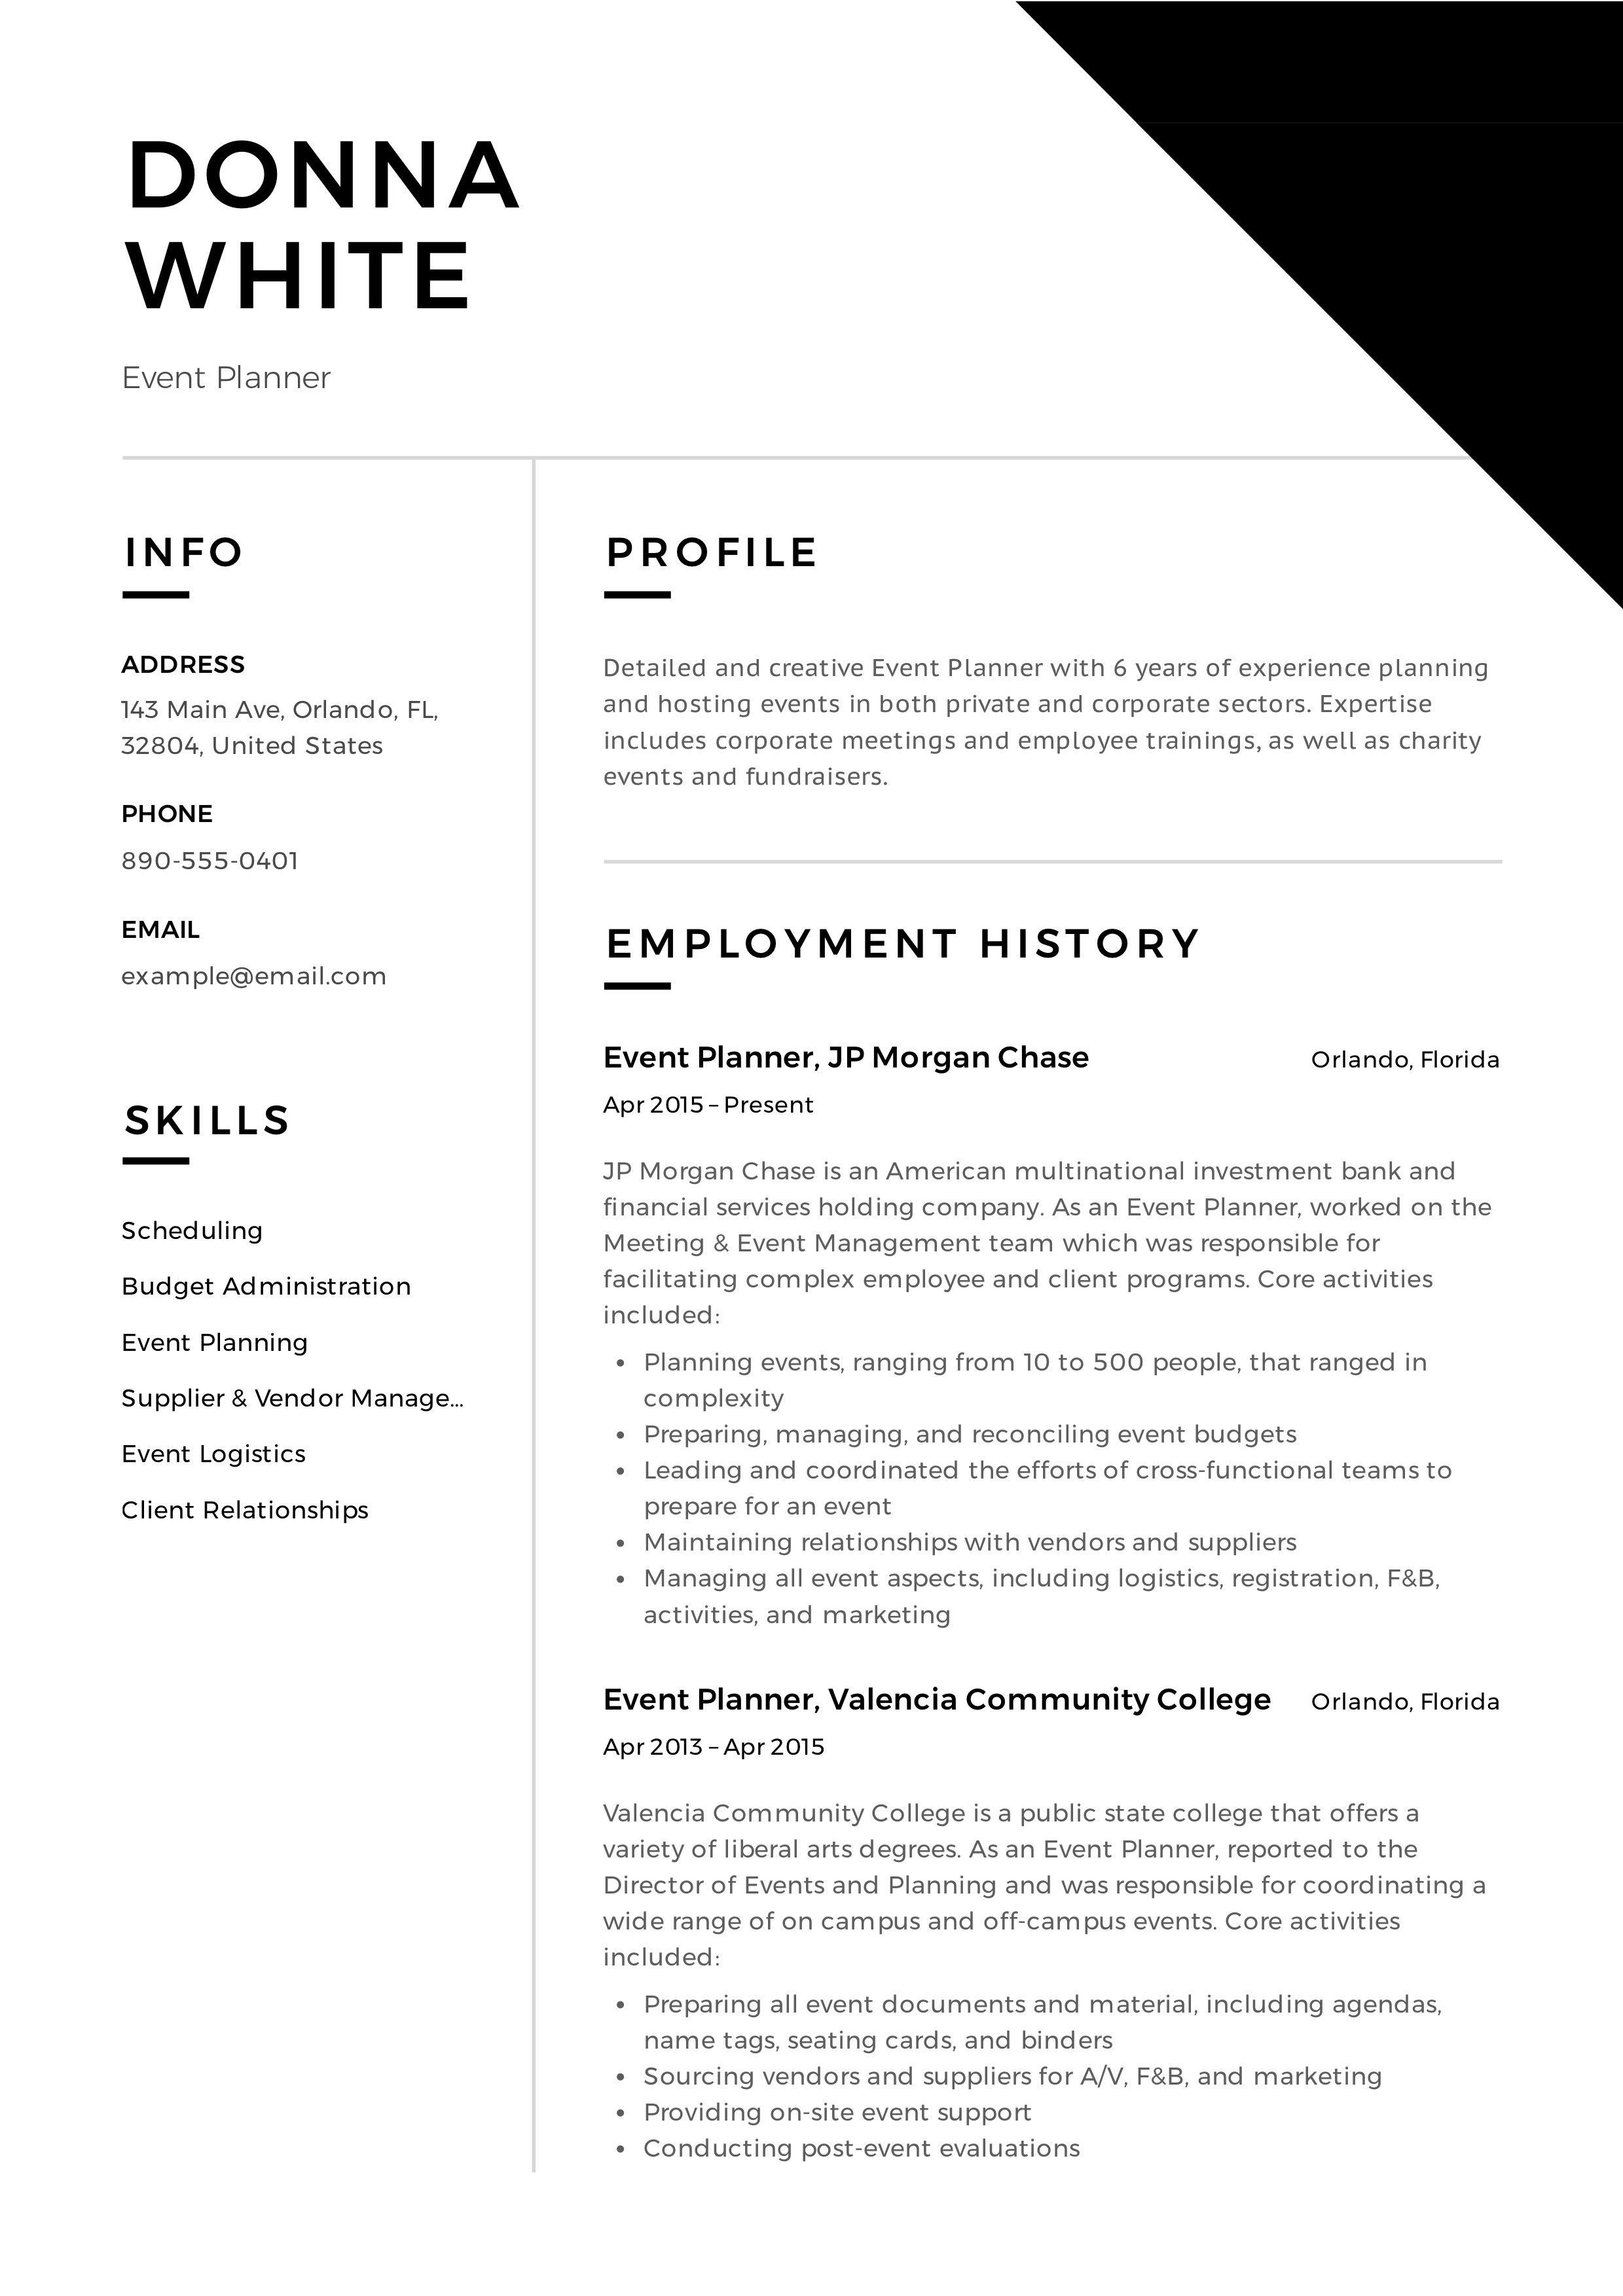 Event Planner Resume Example, Template, Sample, CV, Formal